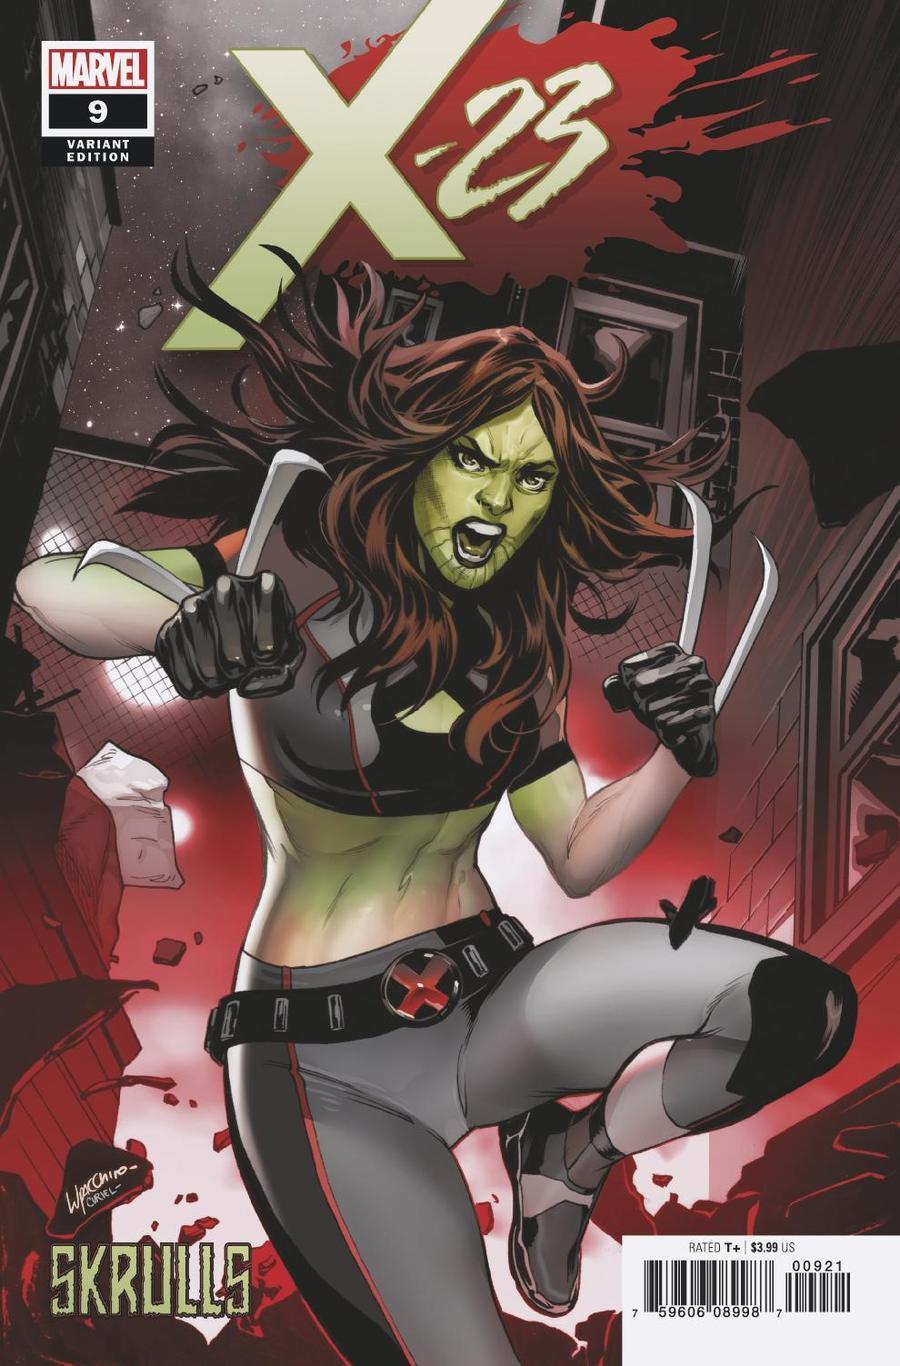 X-23 Vol 3 #9 Cover B Variant Emanuela Lupacchino Skrulls Cover